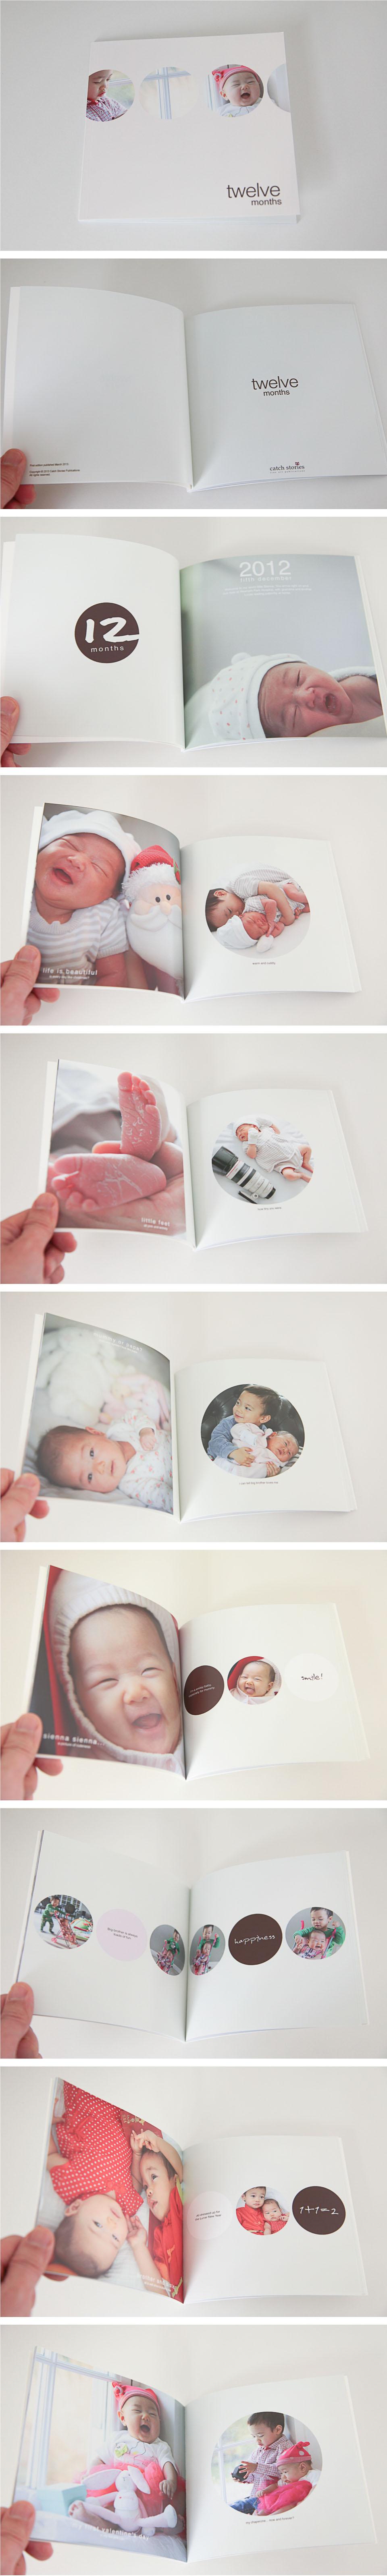 A clean and fun photobook design...